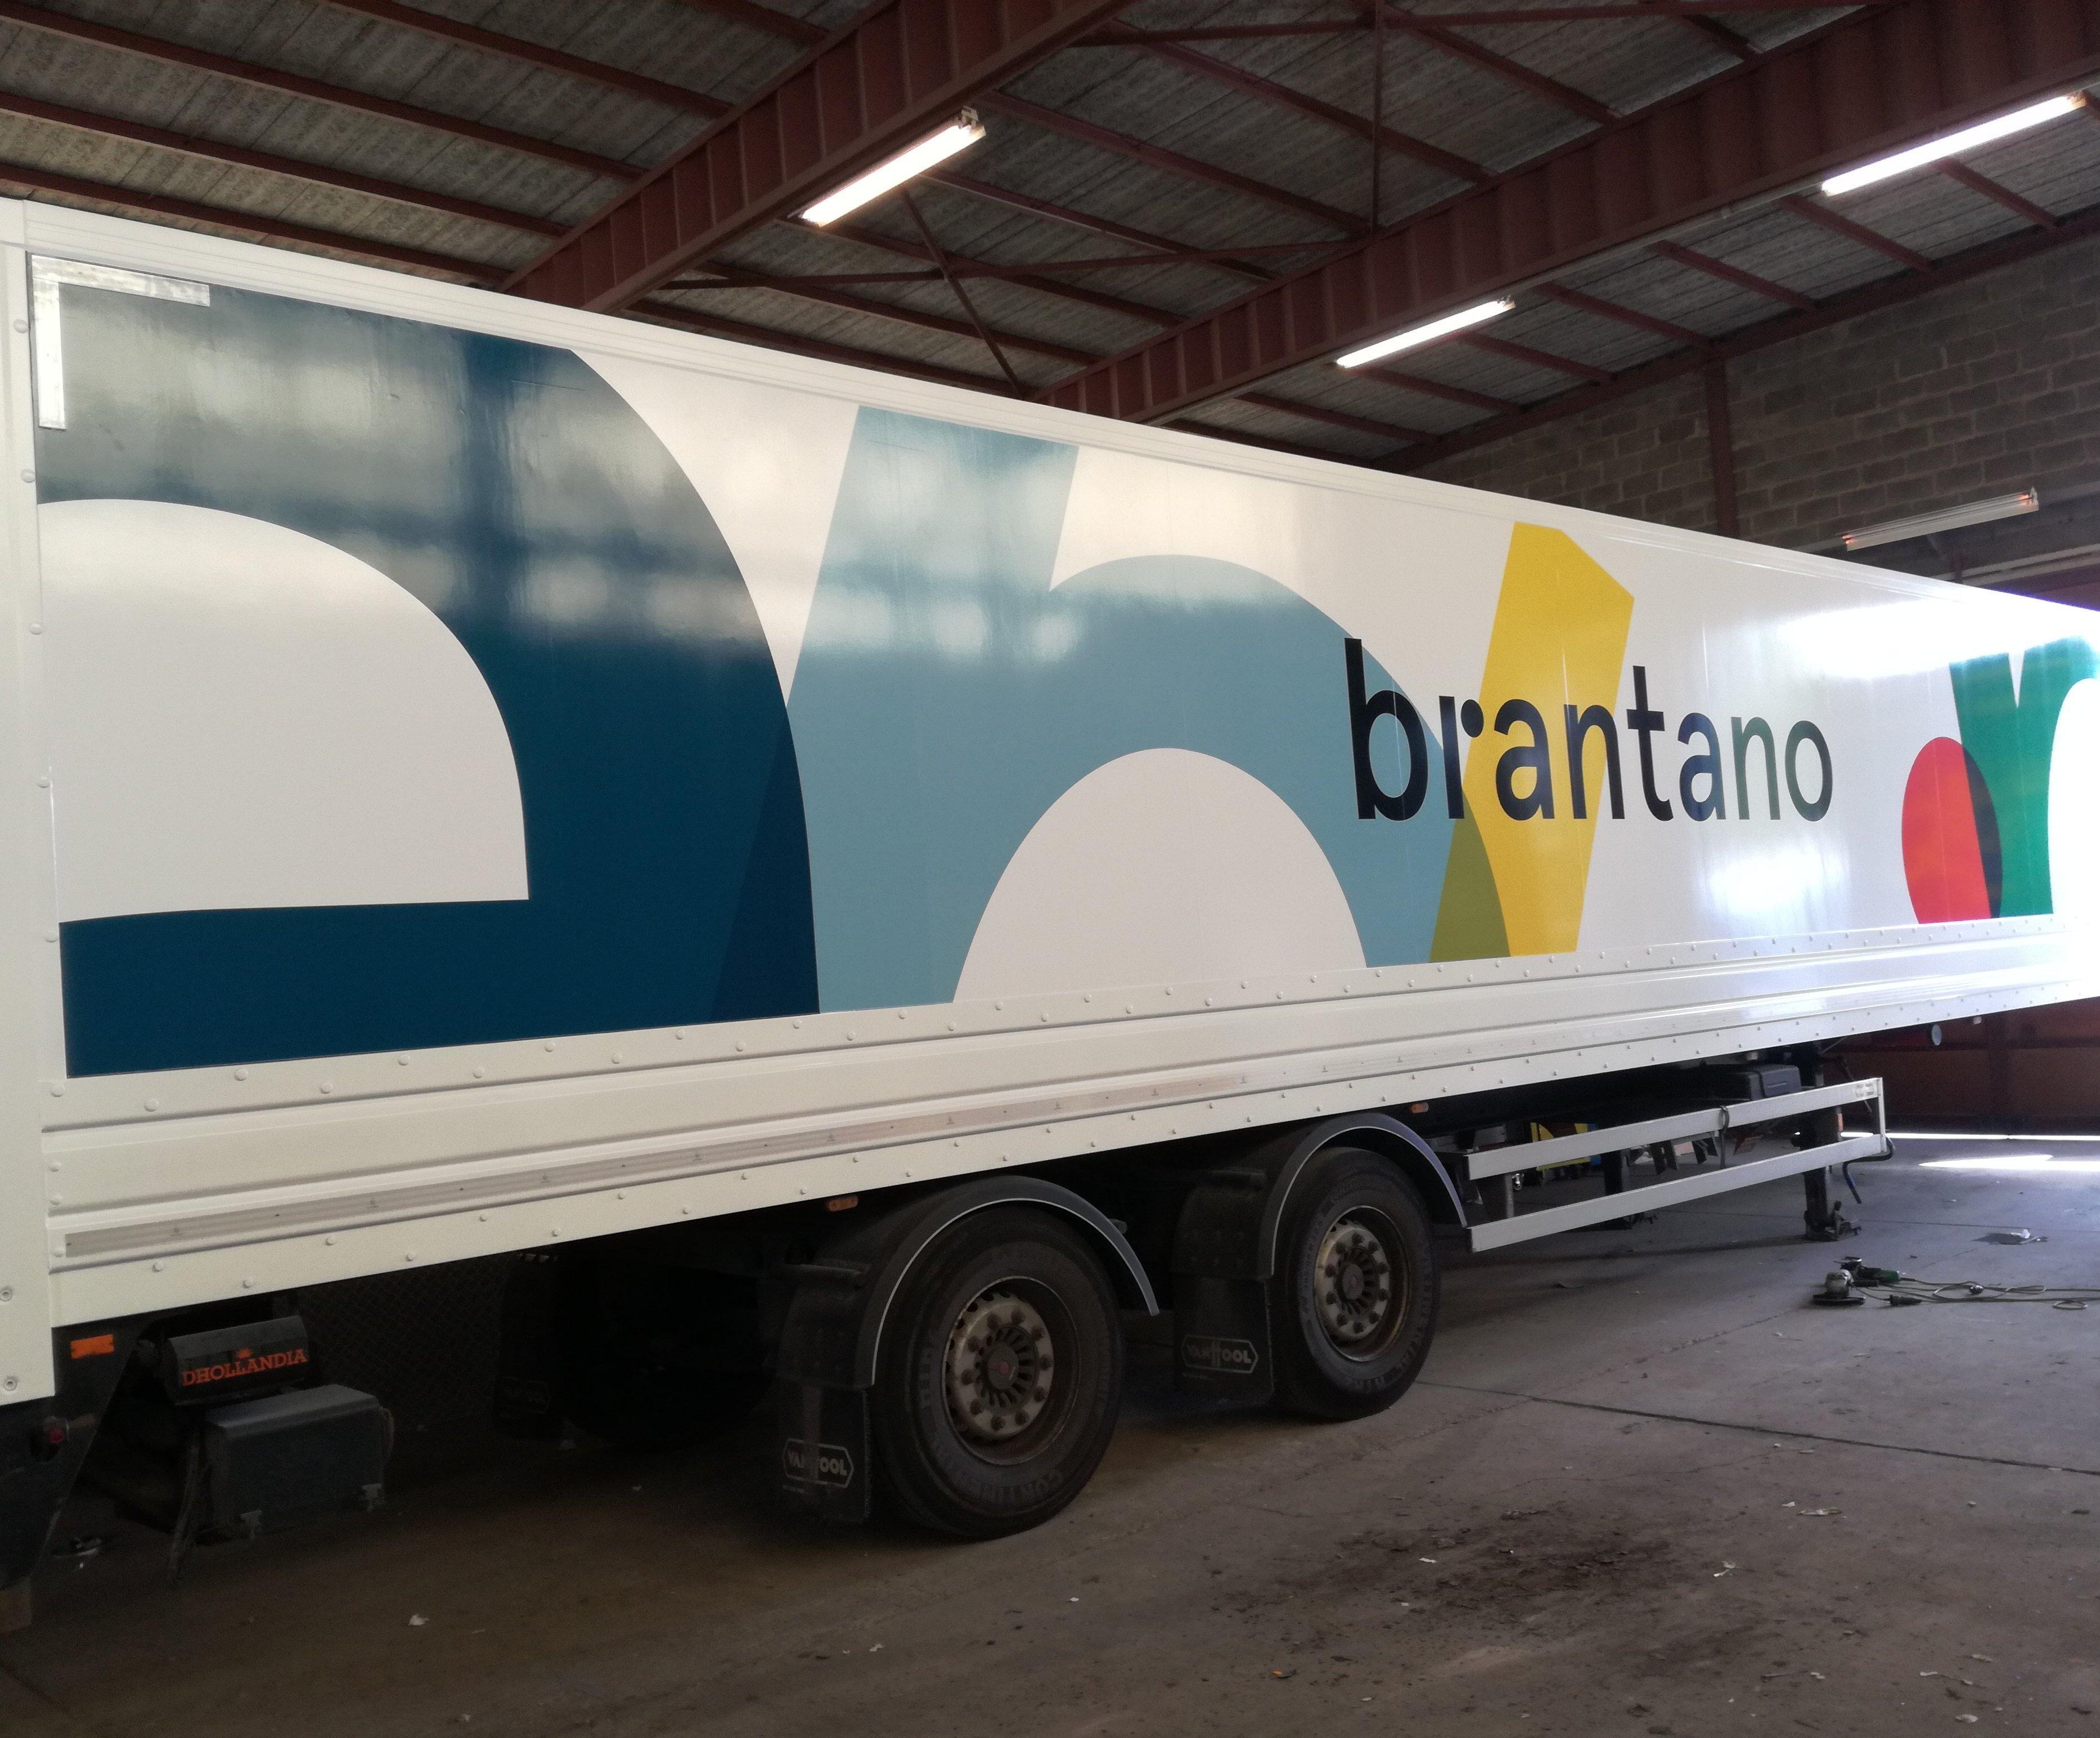 Autobelettering_Brantano